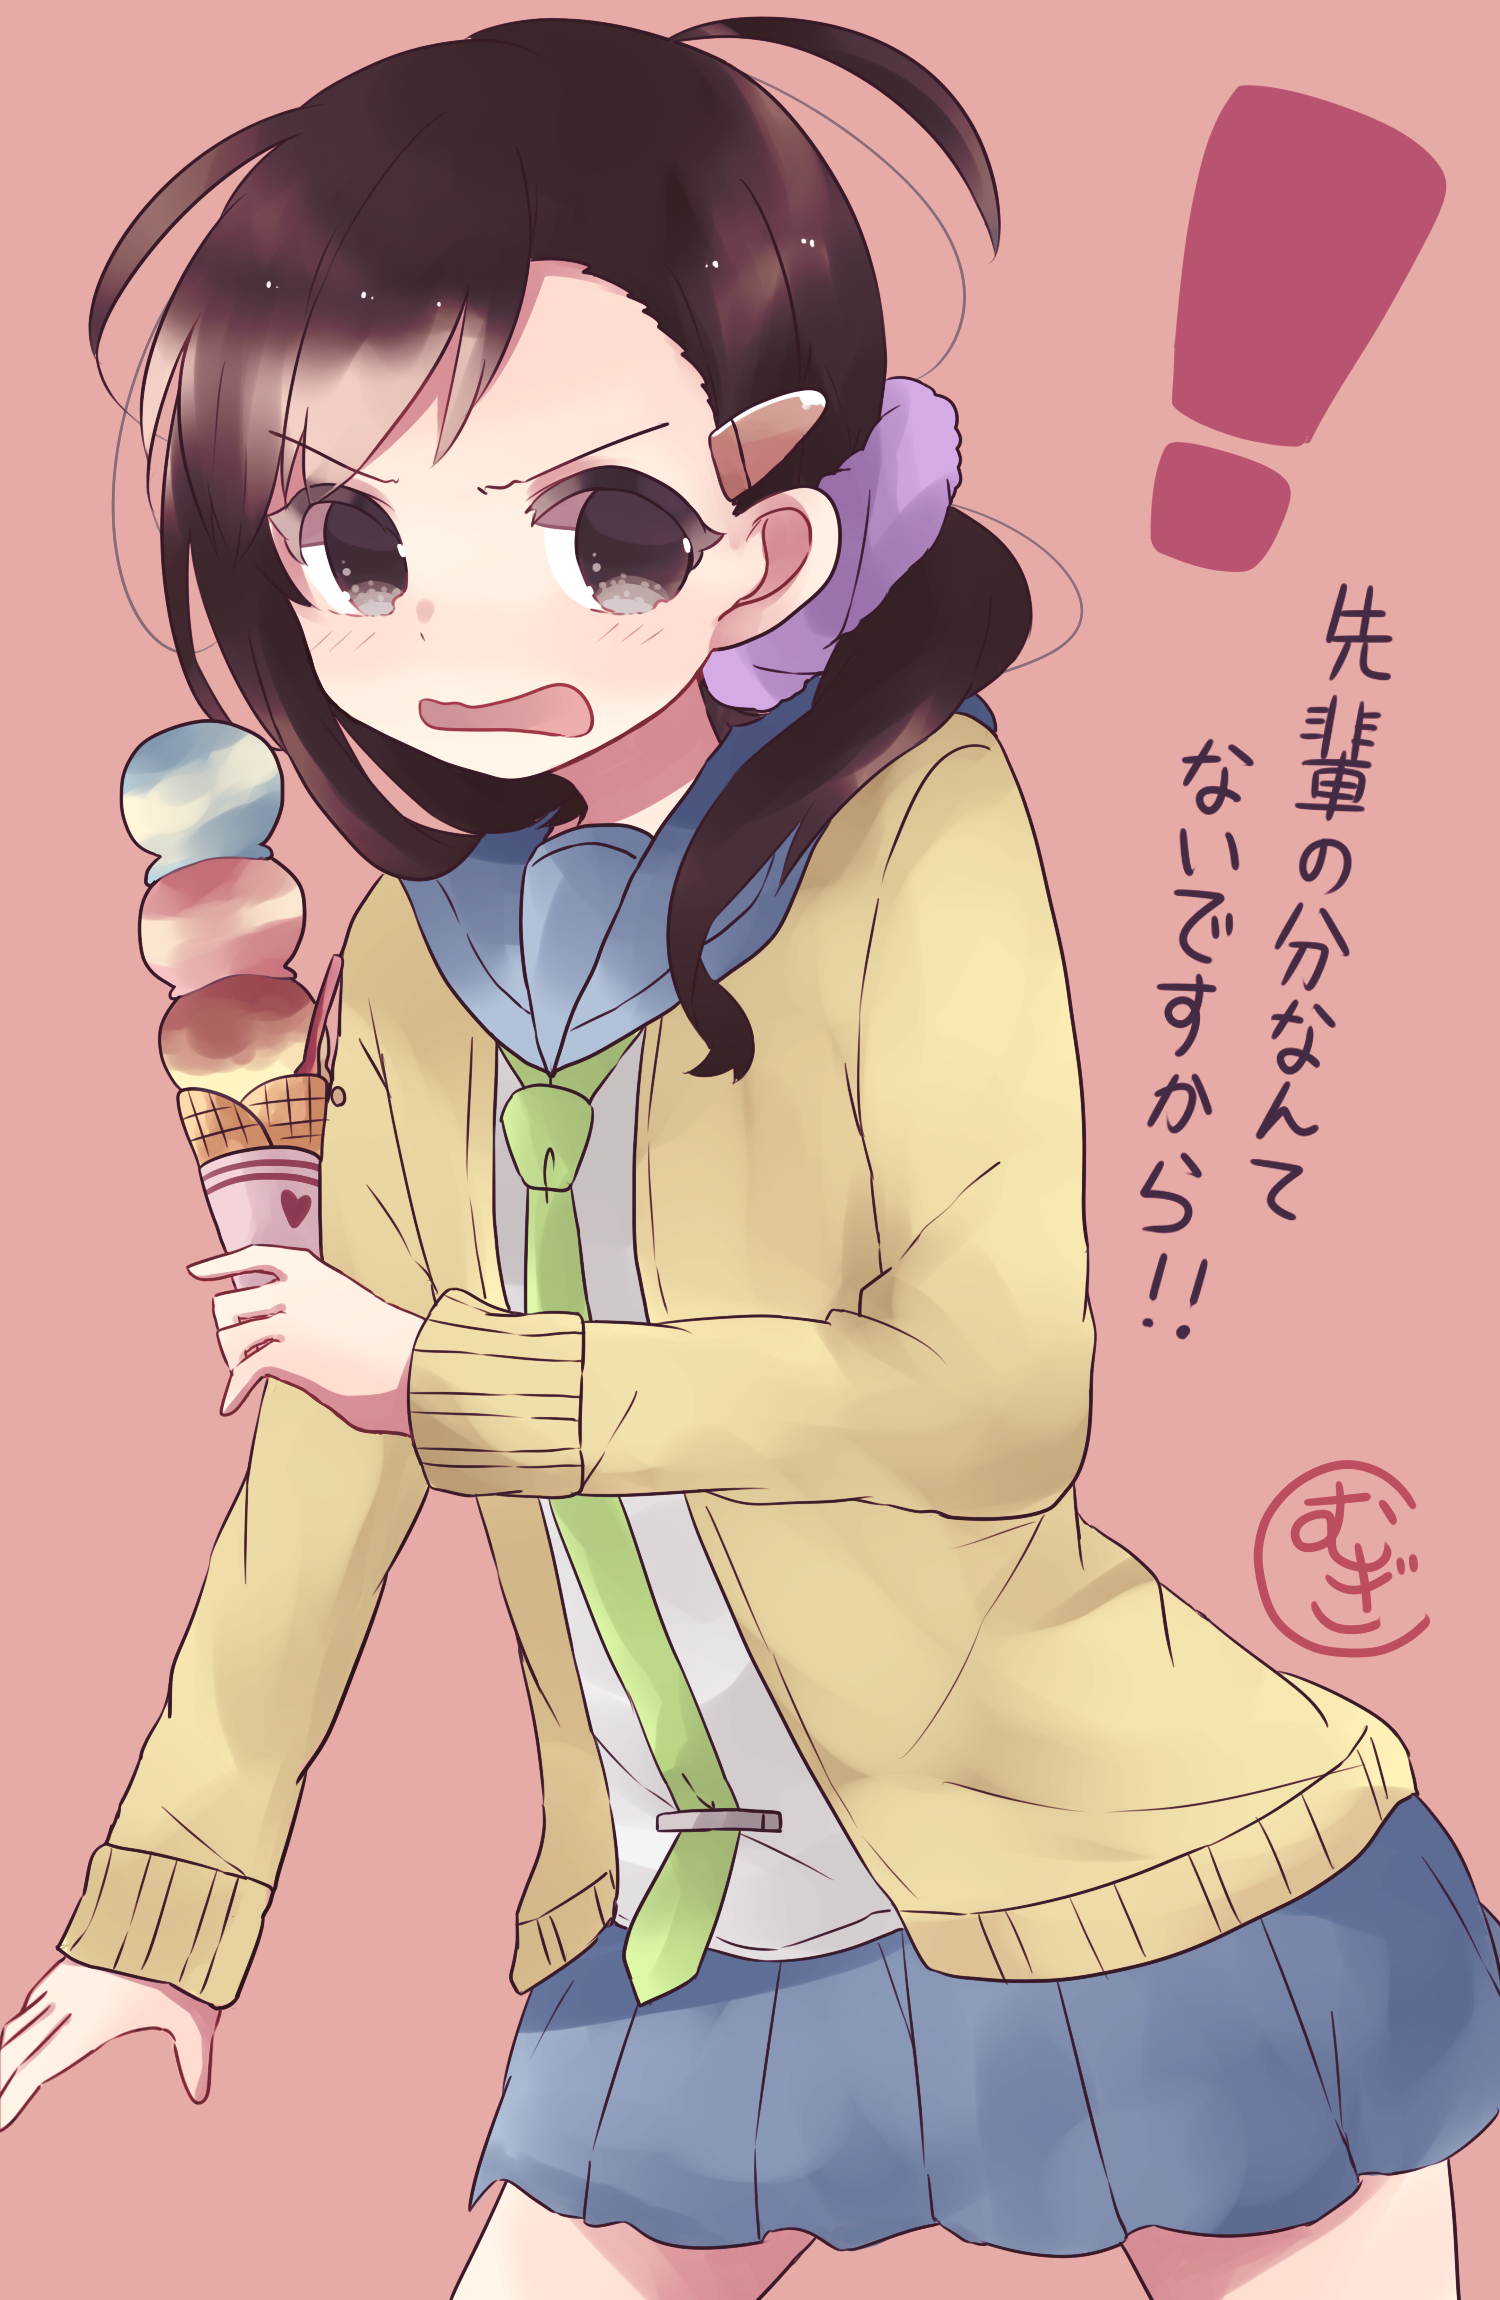 """Onodera Haru"" Nisekoi, Anime, Haru"